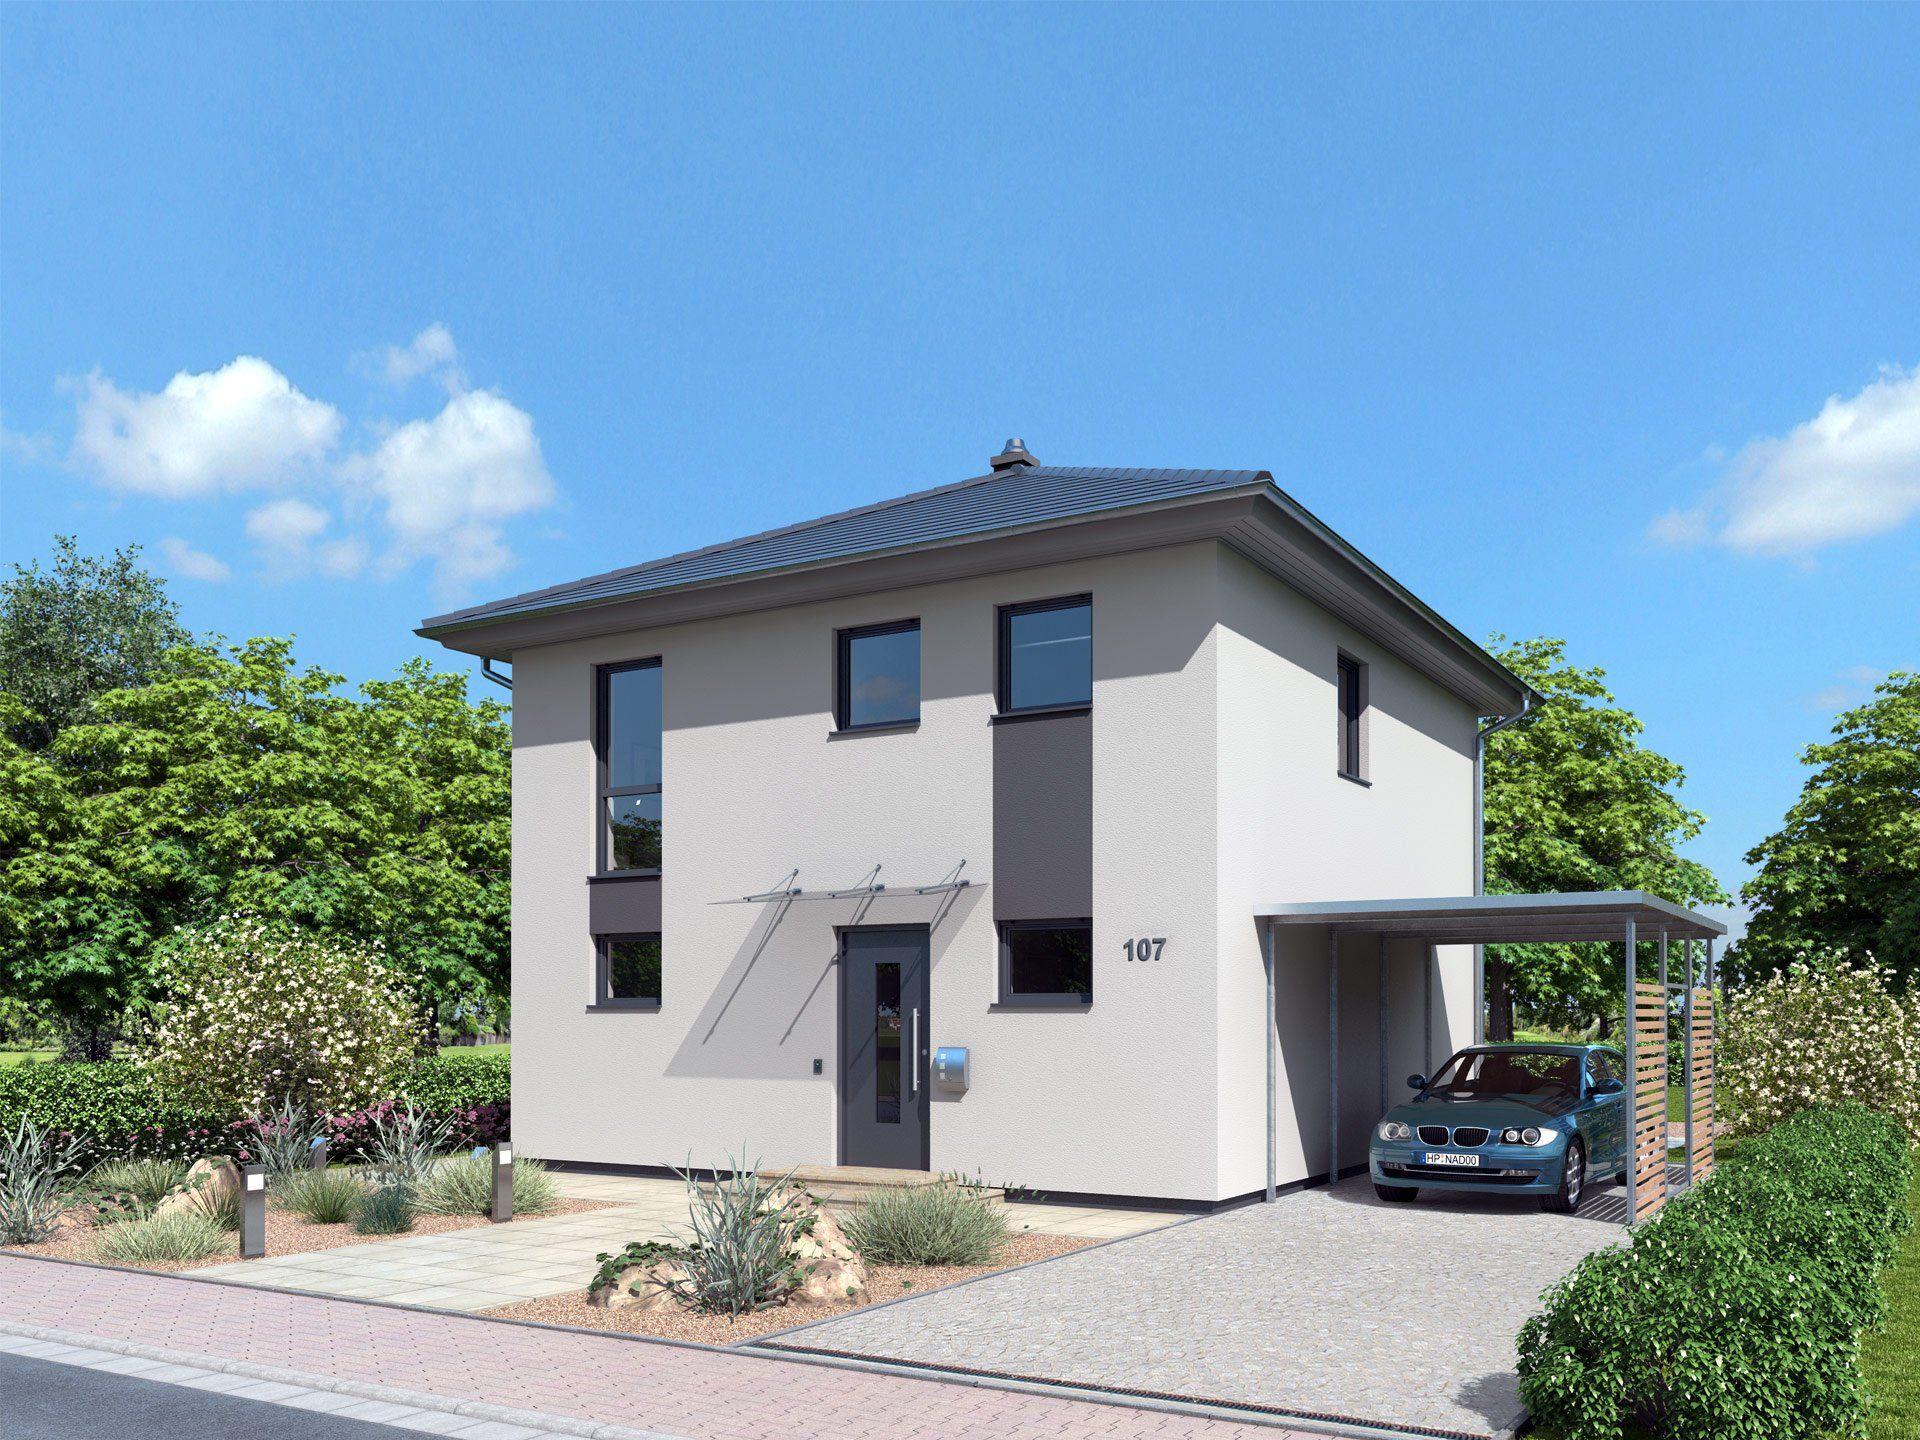 Kompakthaus 107 stadtvilla von ytong bausatzhaus for Fertighaus kubus